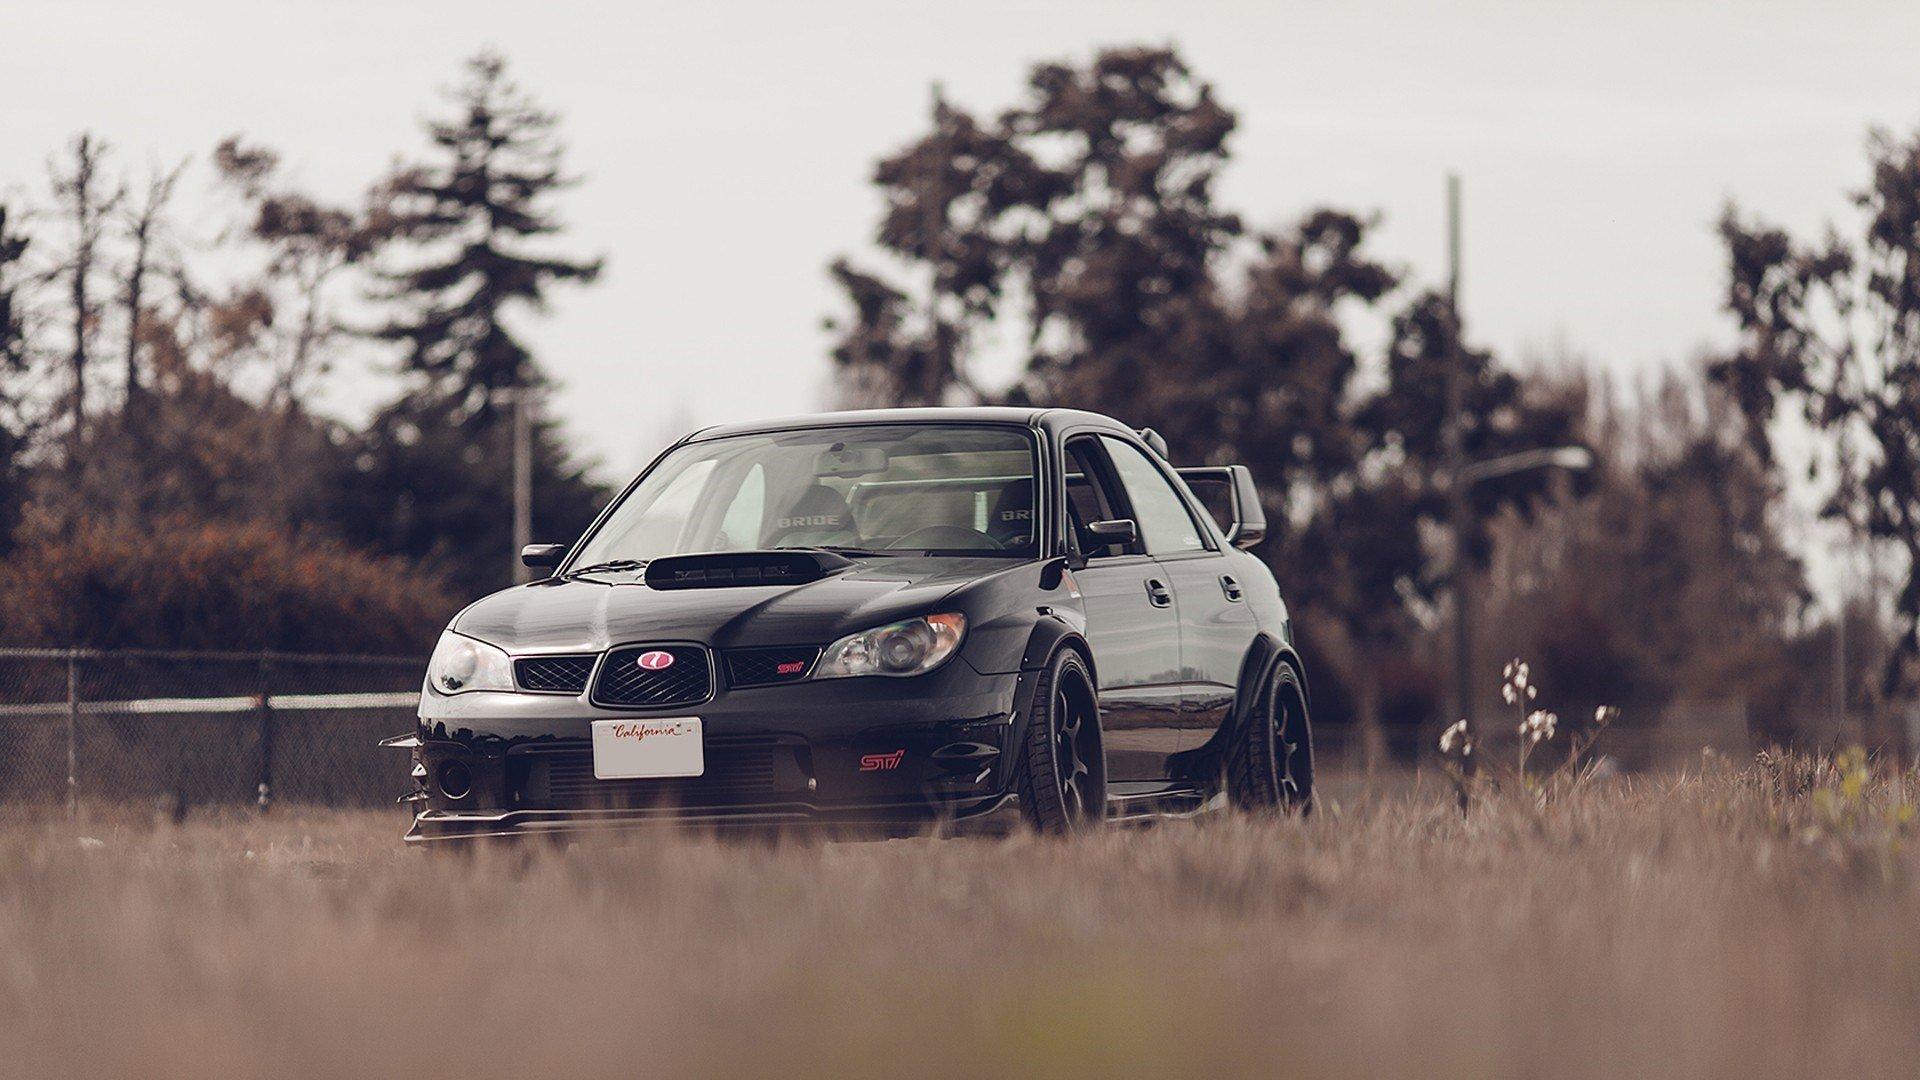 Best Subaru Impreza WRX STI wallpaper